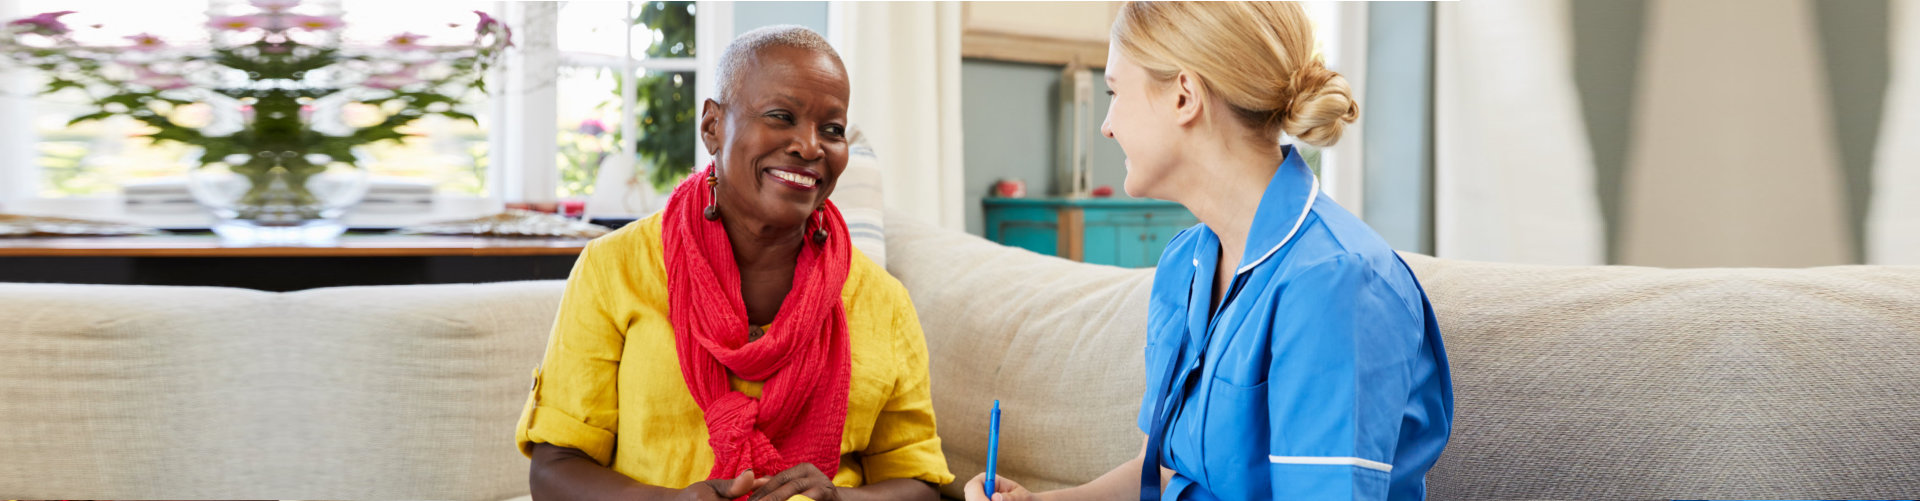 happy senior woman and caregiver talking